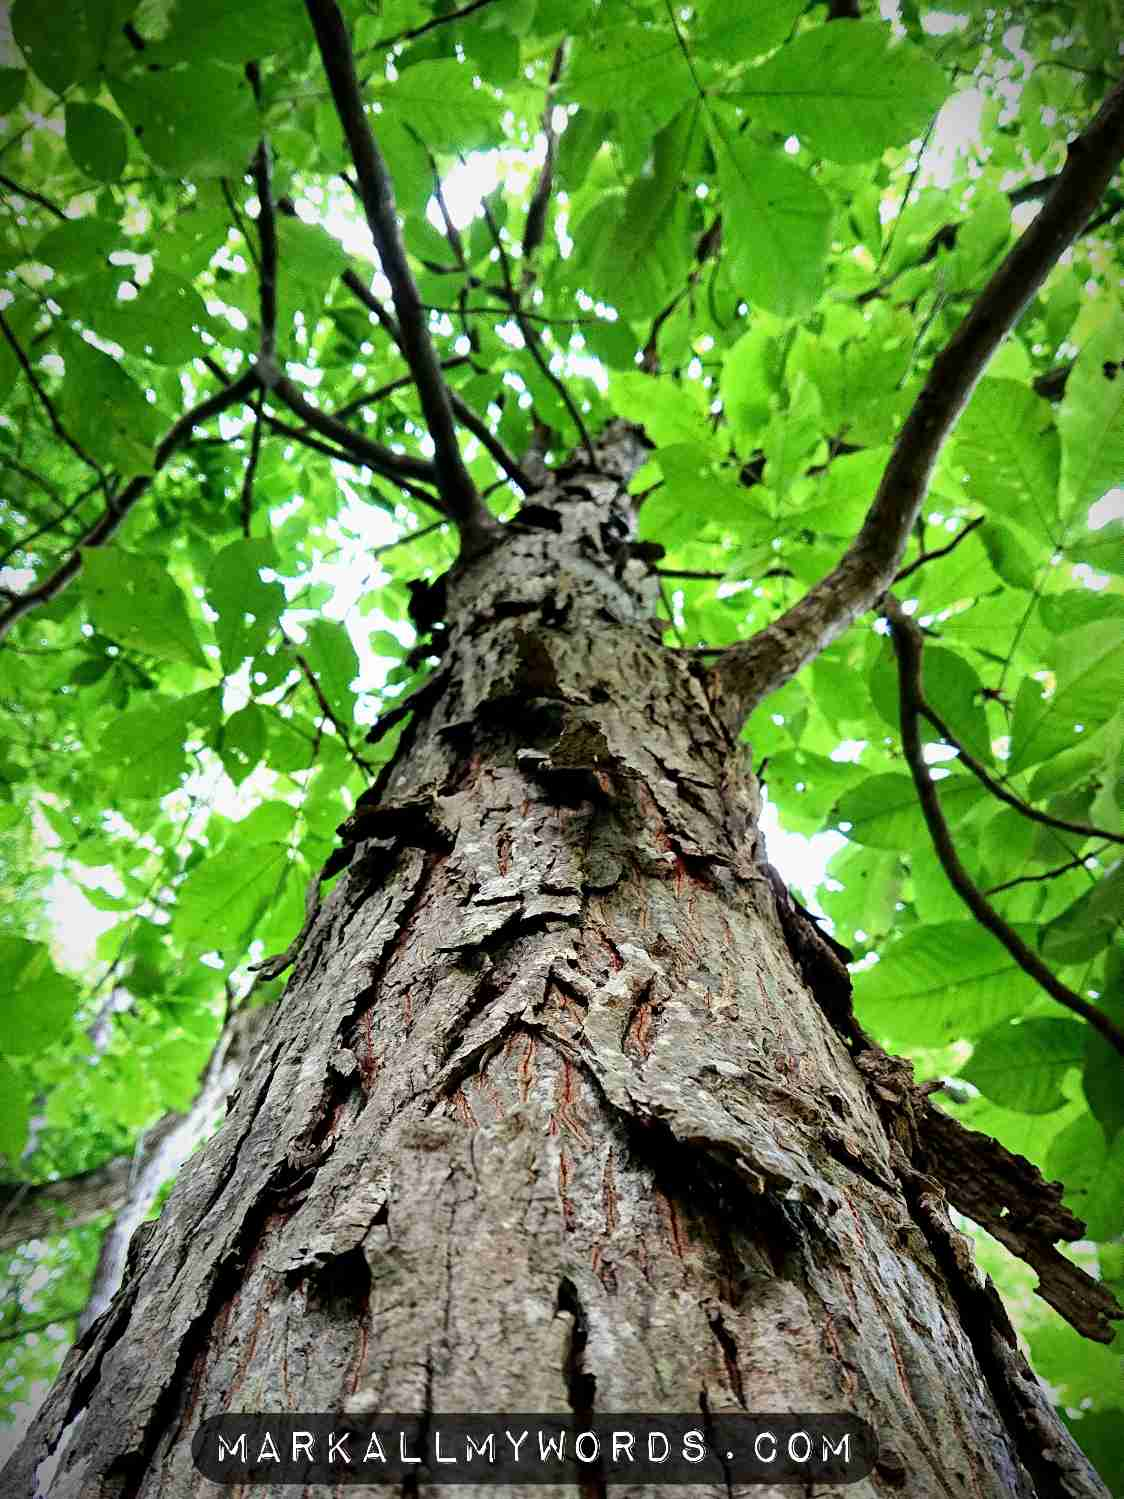 Looking up a Shagbark hickory